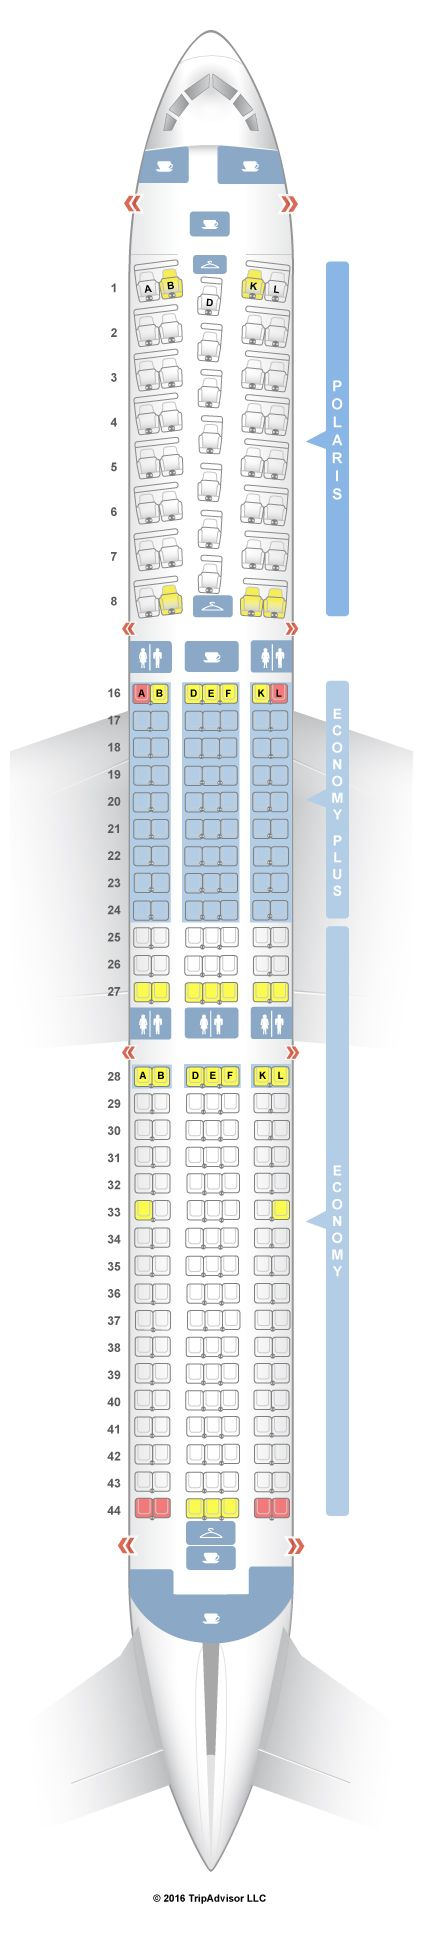 SeatGuru Seat Map United Boeing 767-400ER (764) Intl - SeatGuru